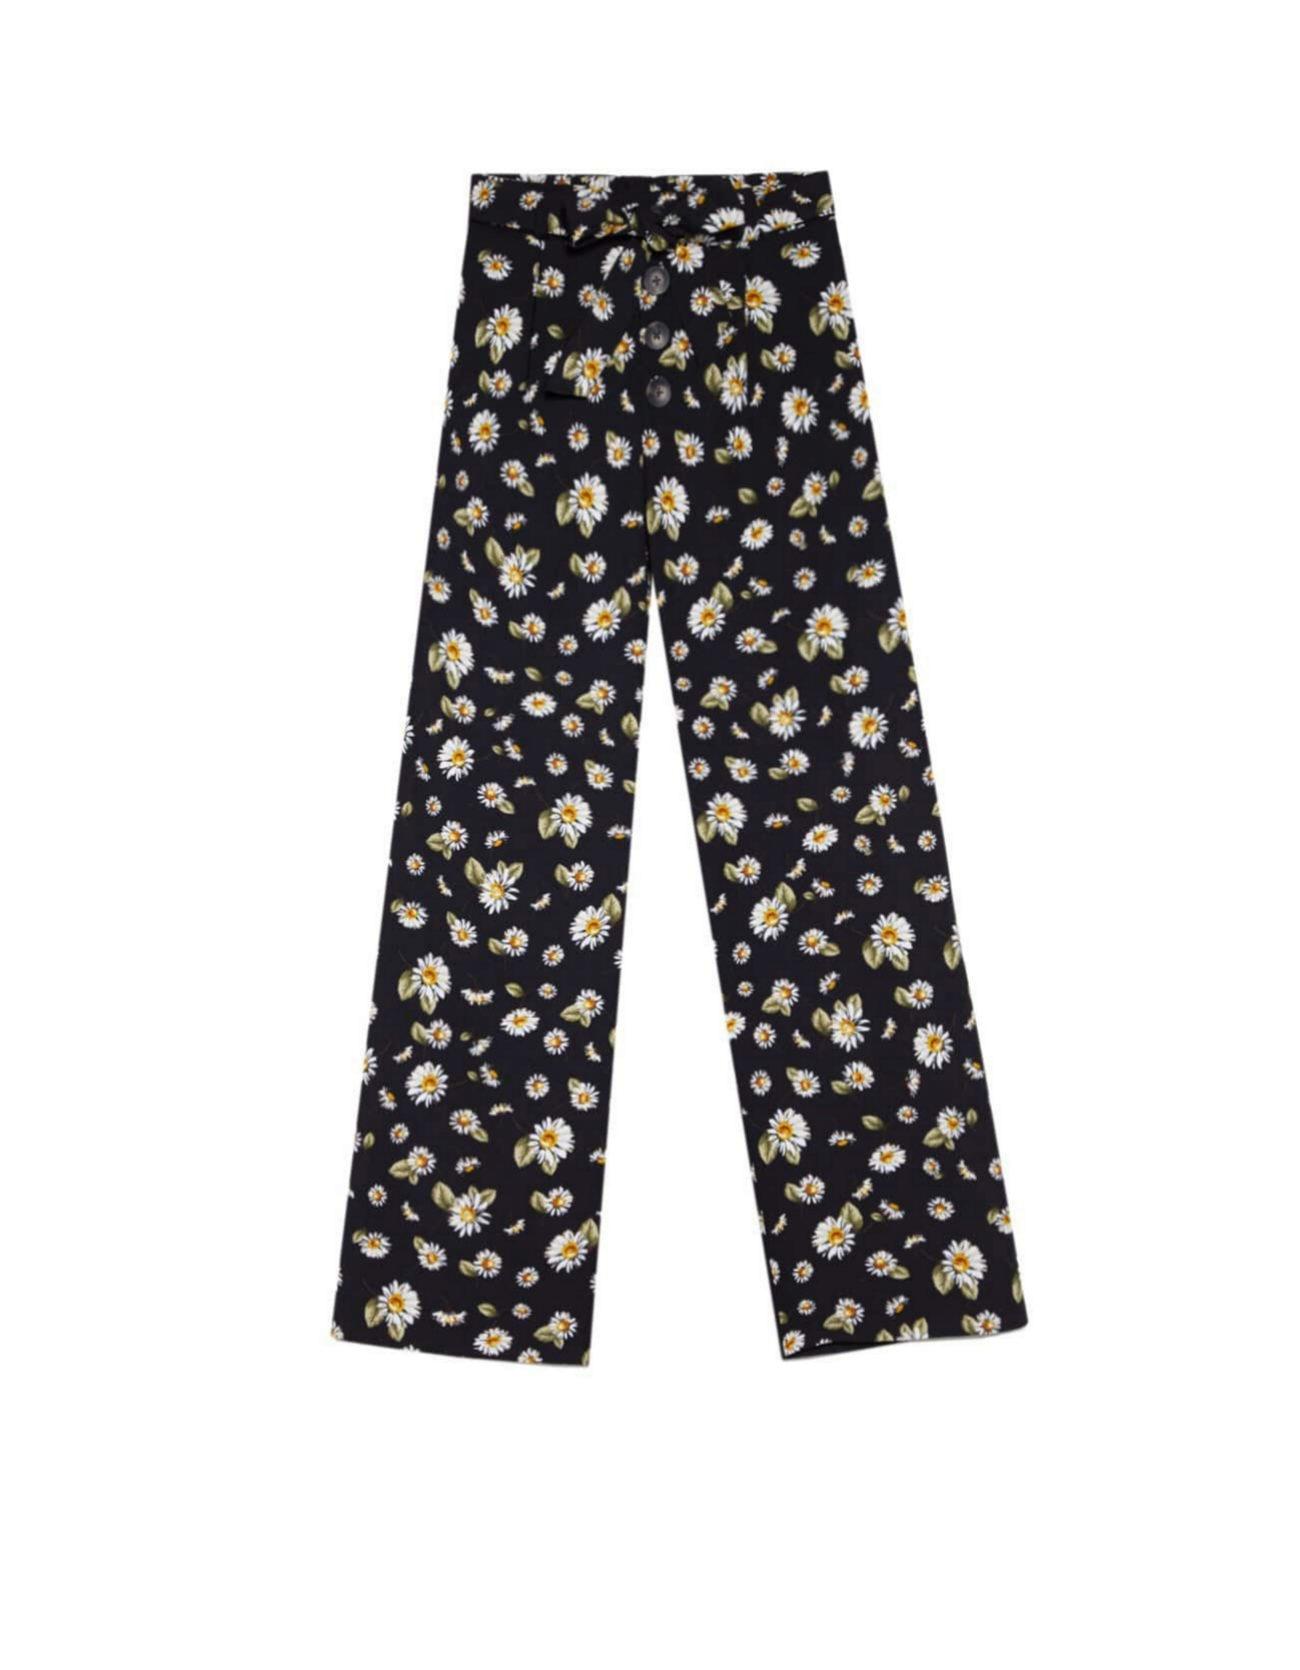 Pantalones anchos de print floral de Stradivarius